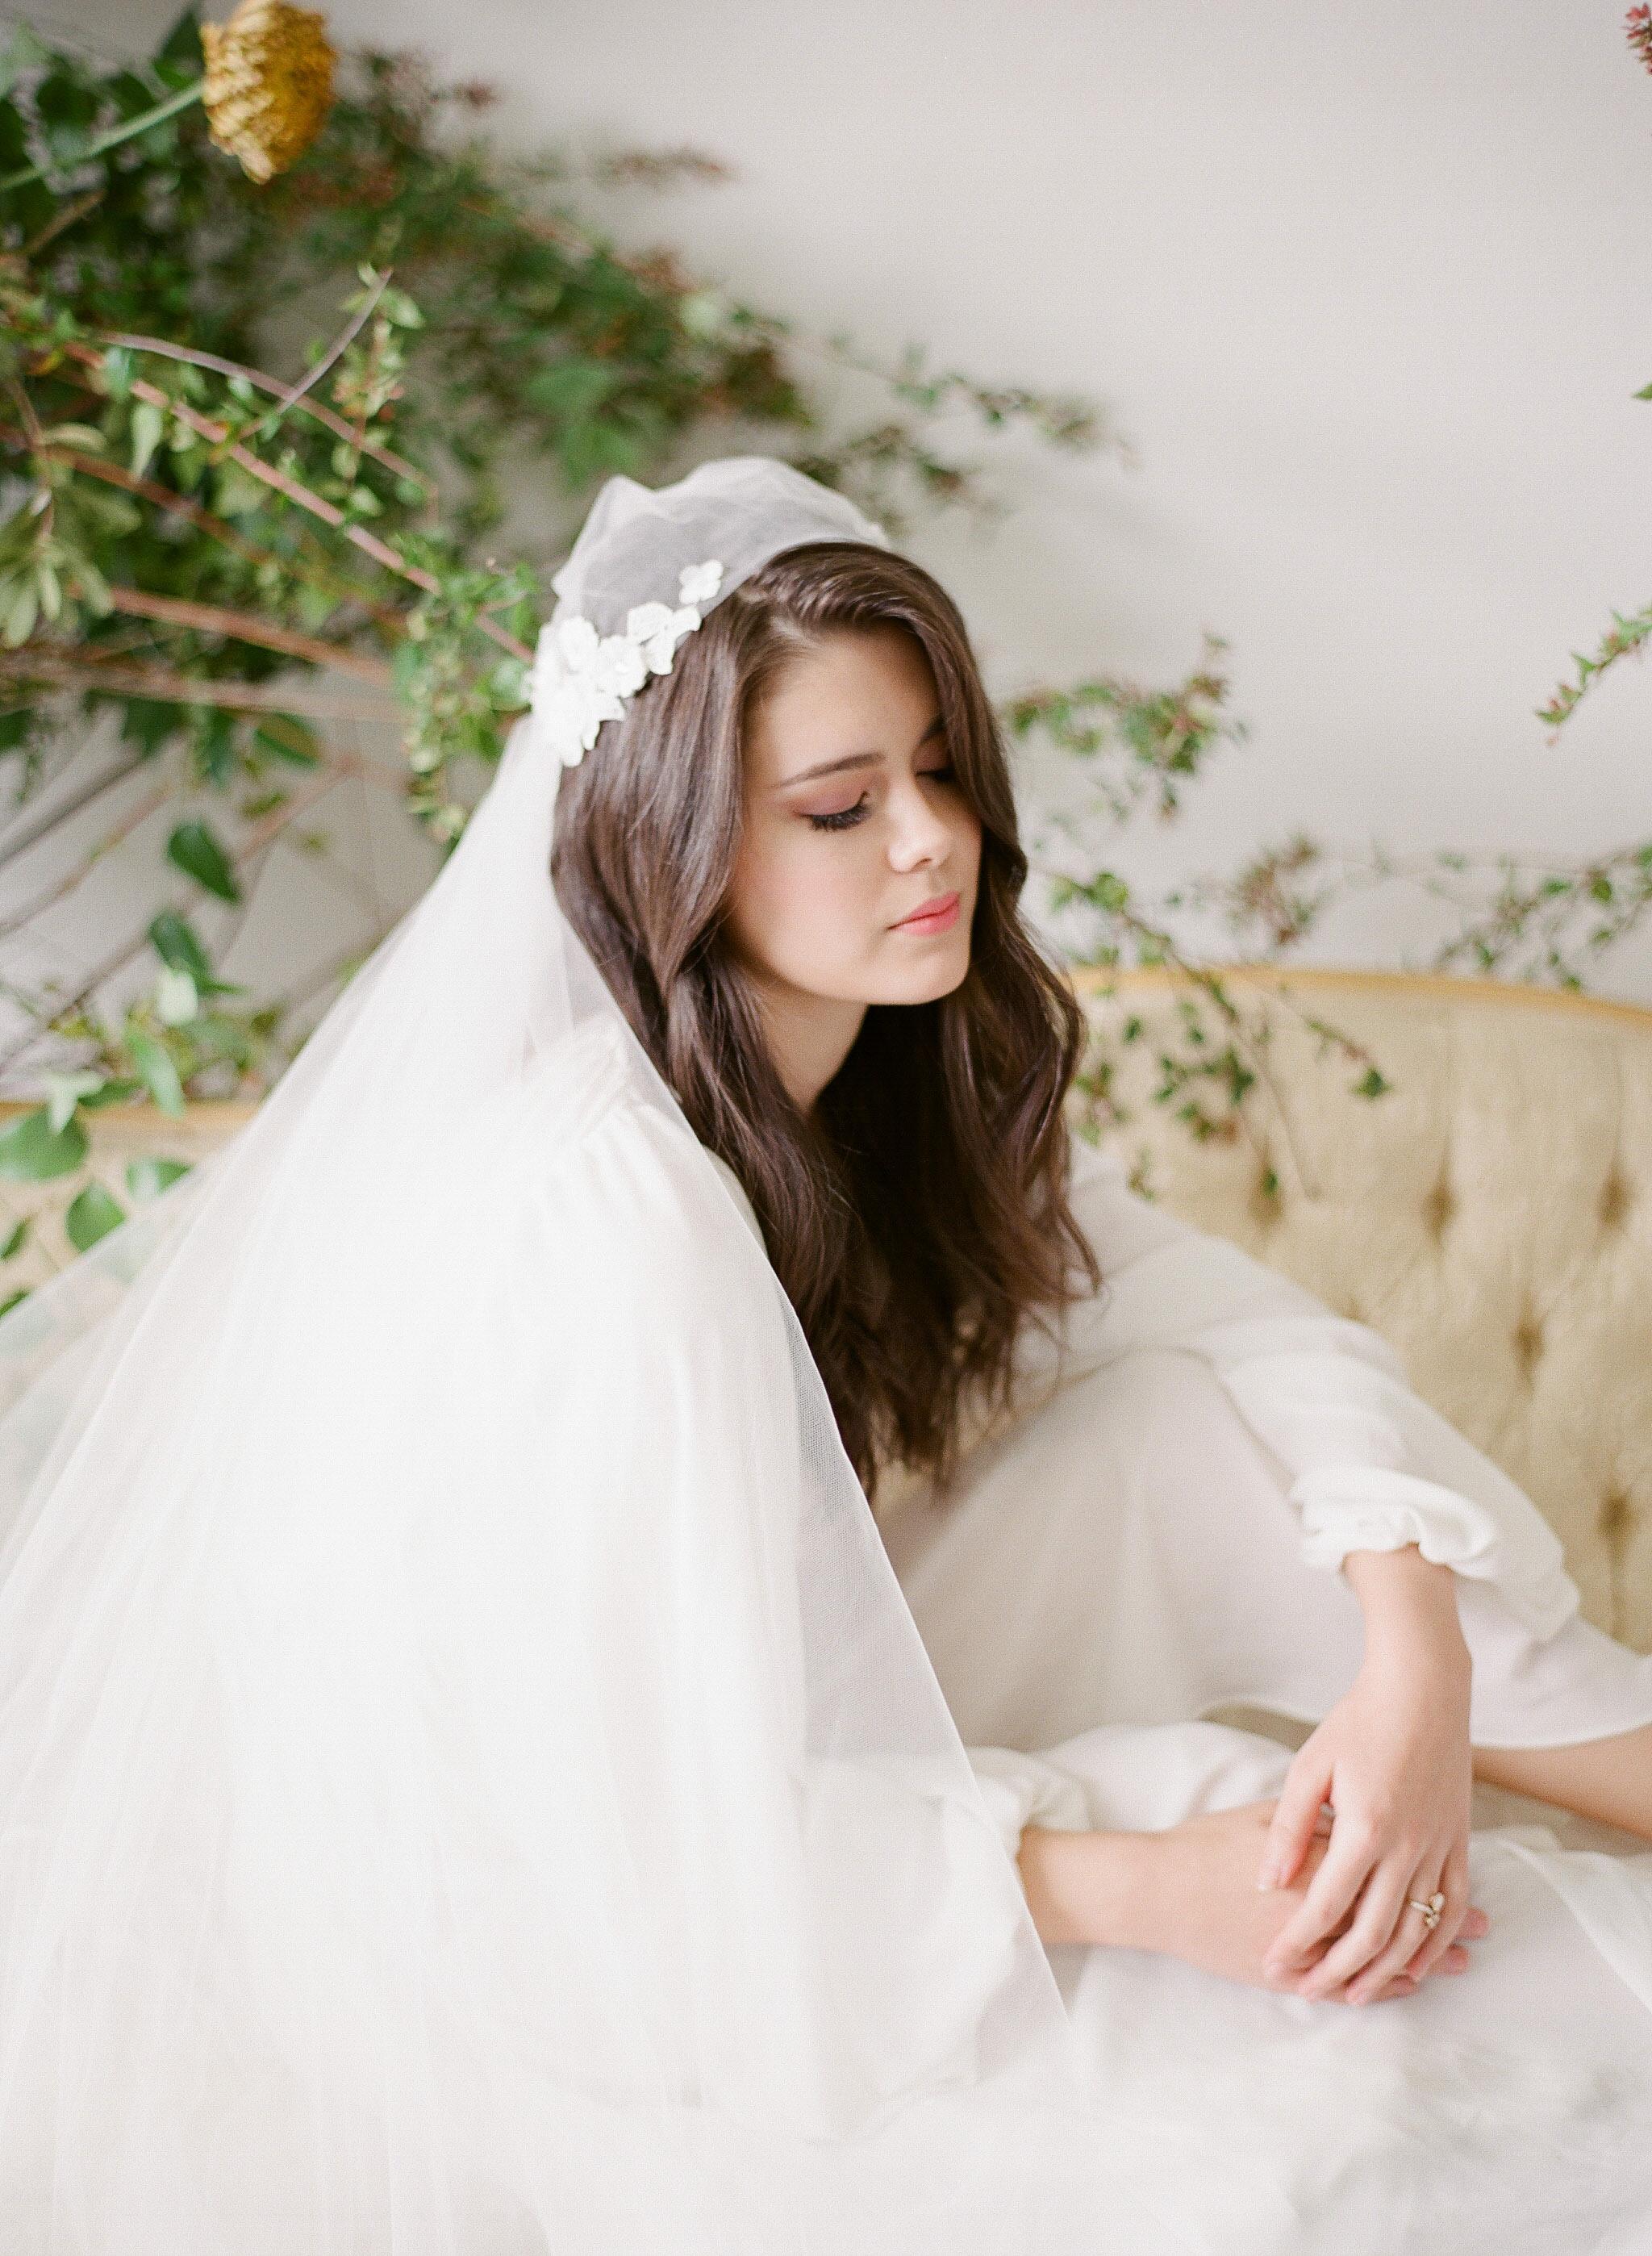 JennySoiPhotography-BridalBoudoireditorial-146.jpg